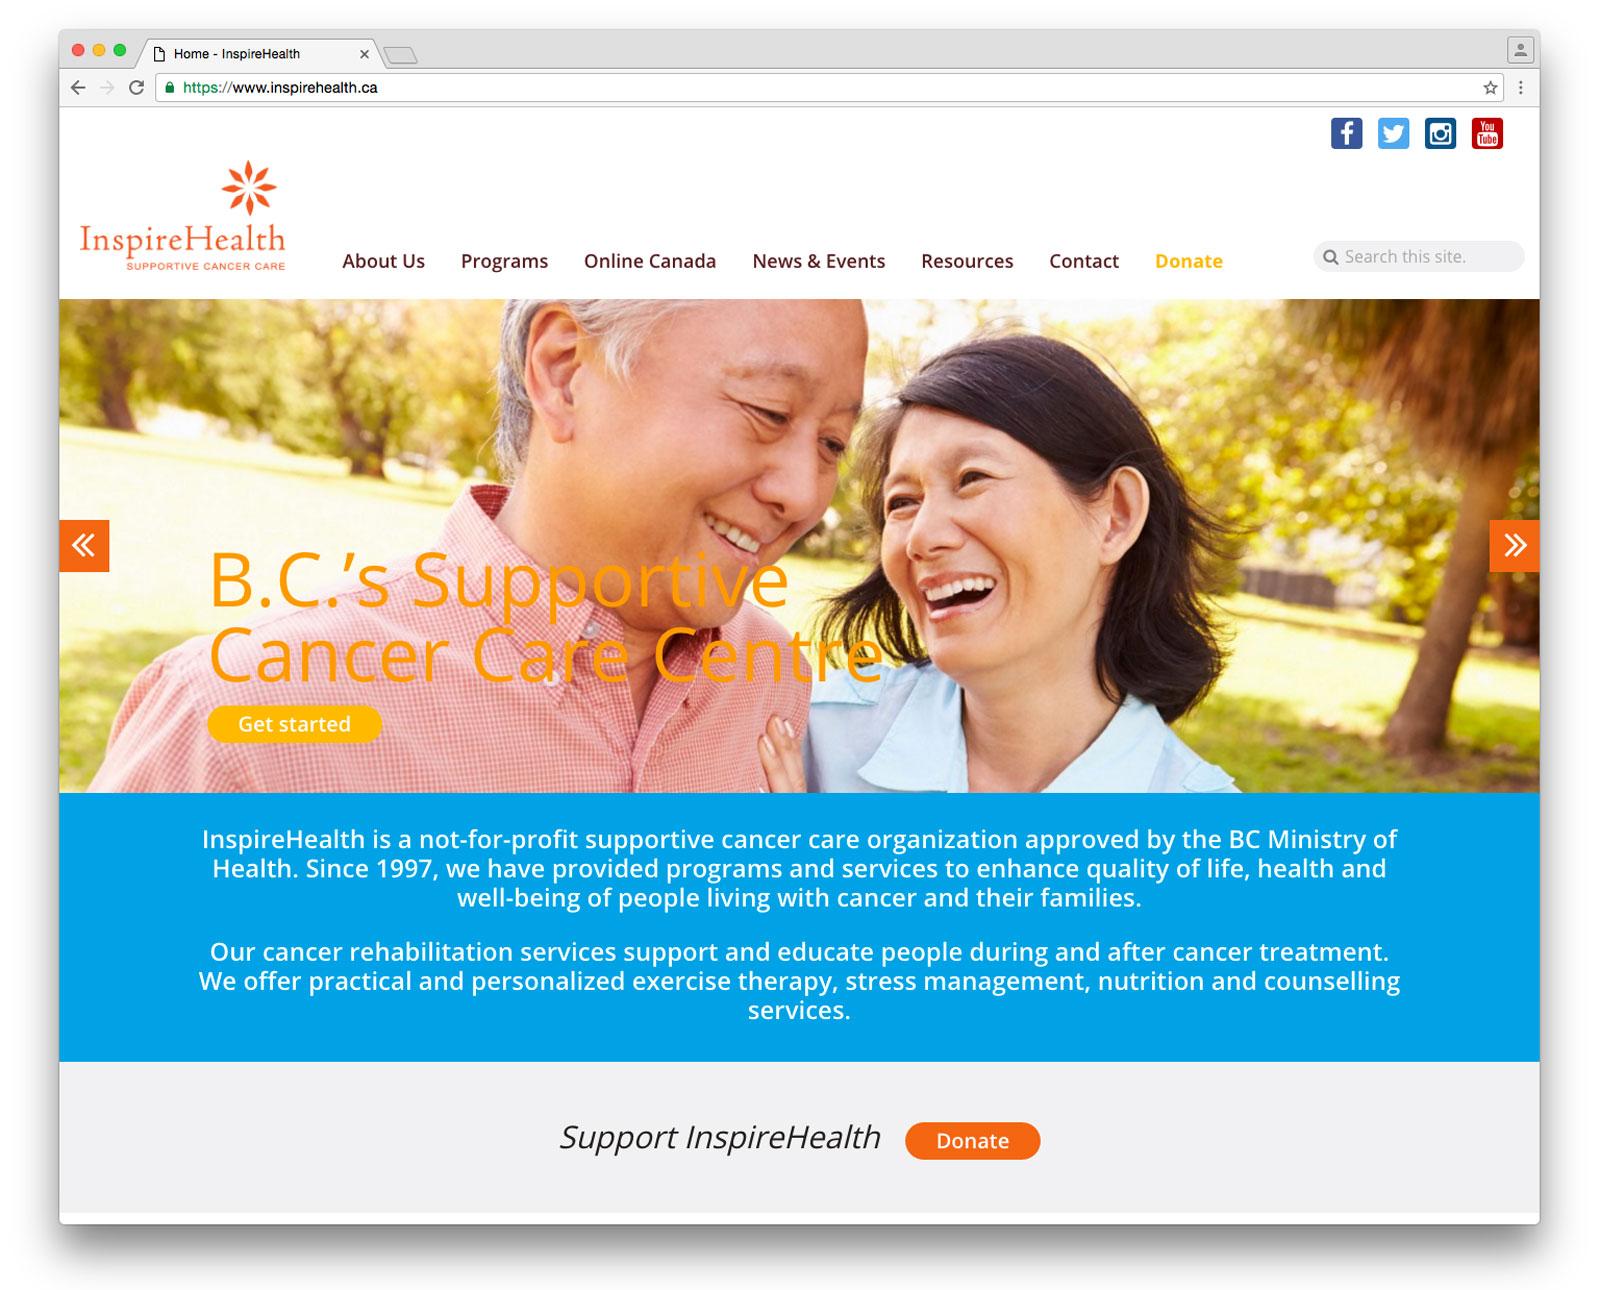 health services website design sample page